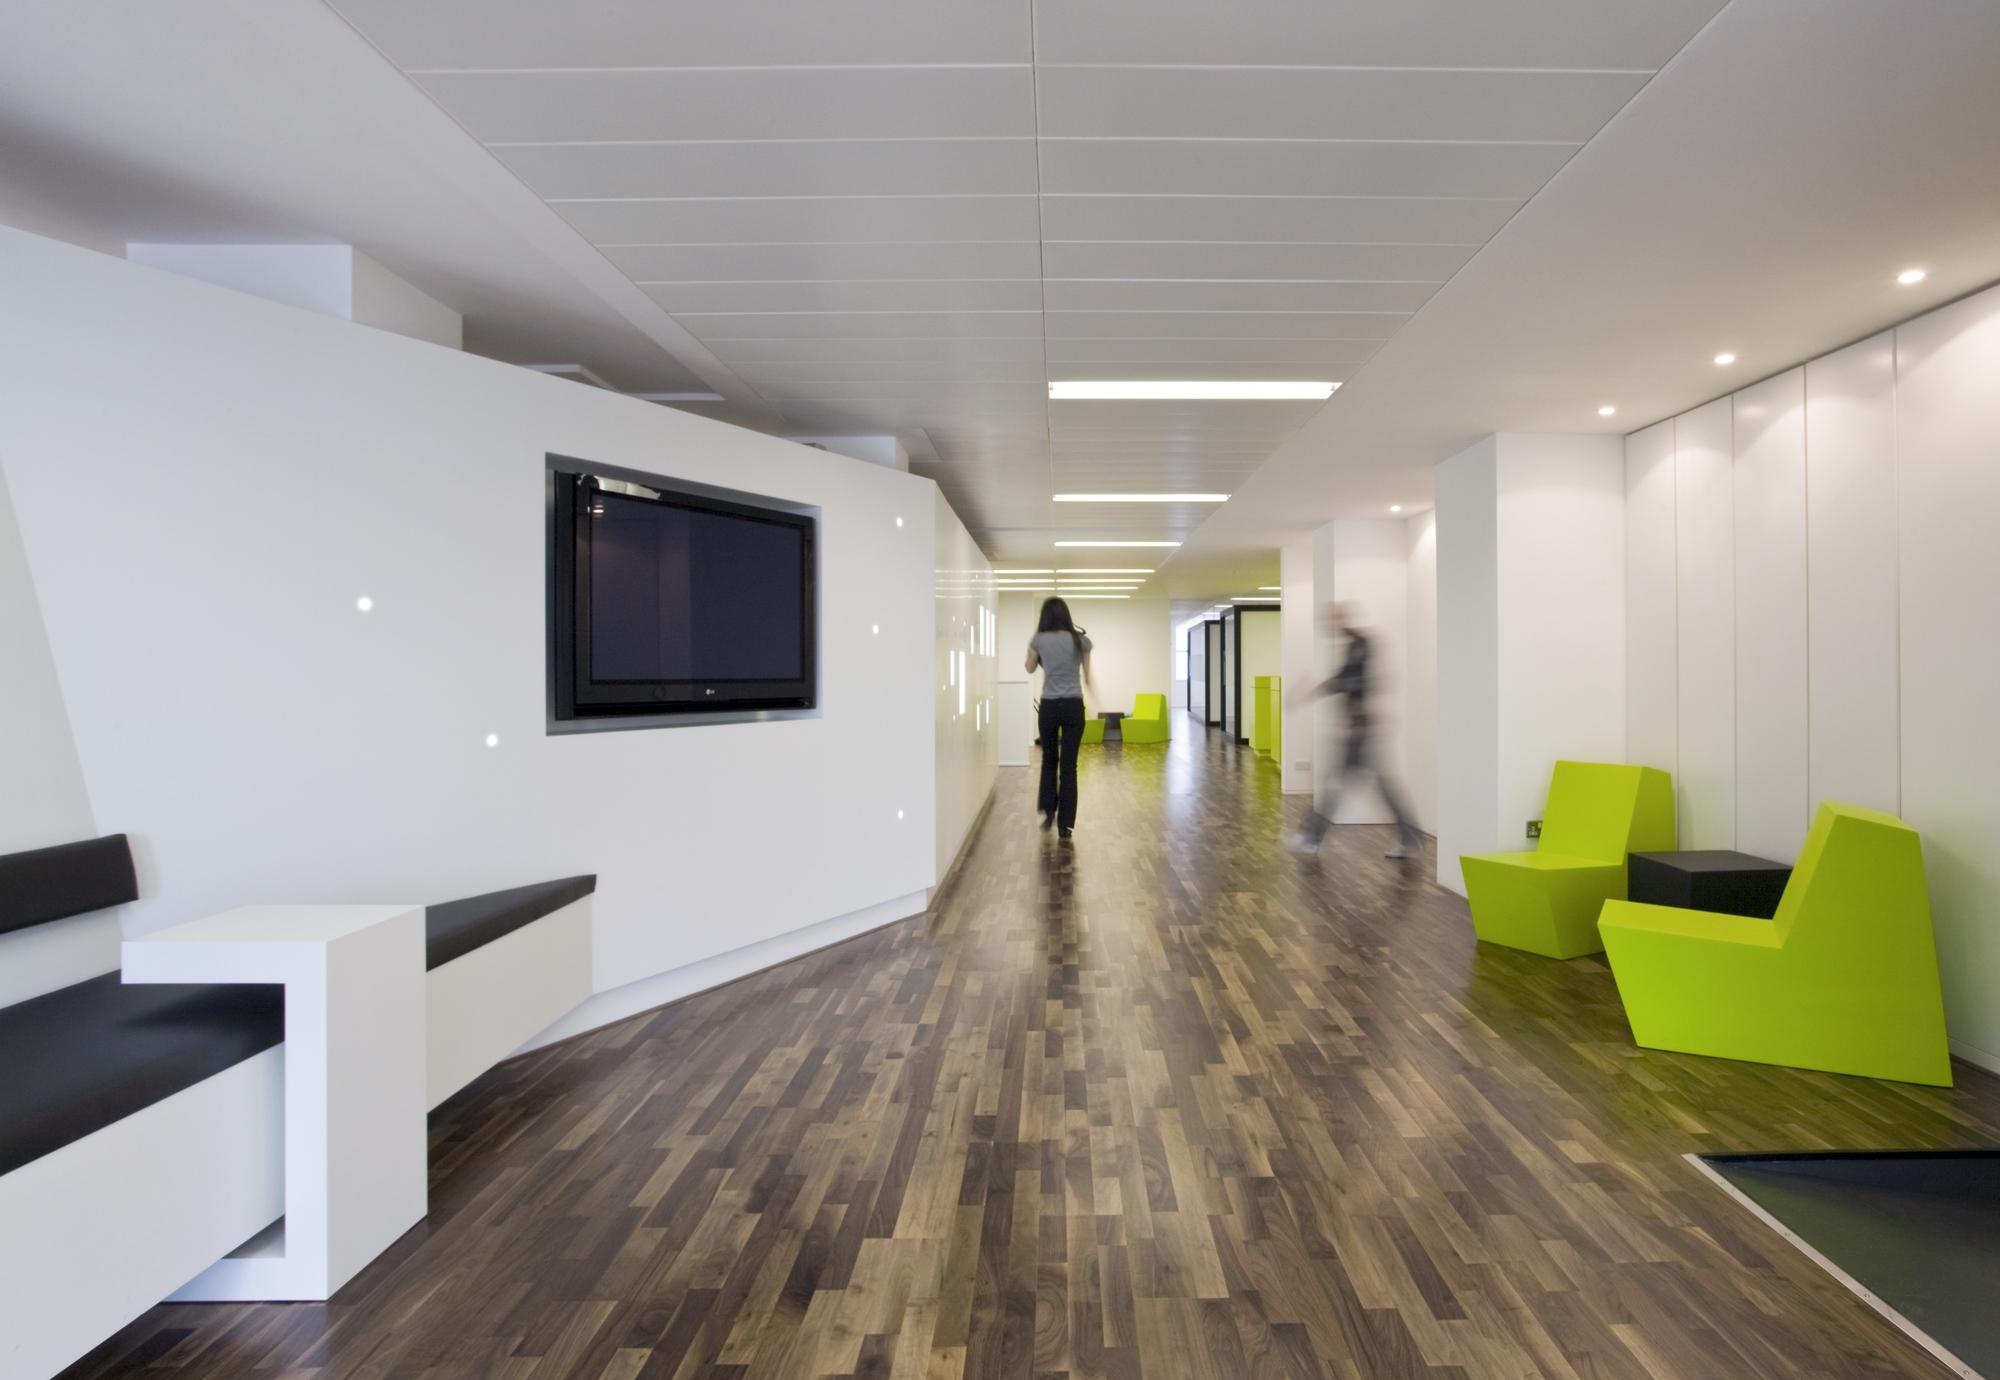 Centro de Design Europeu LG / Jump Studios, © Gareth Gardner